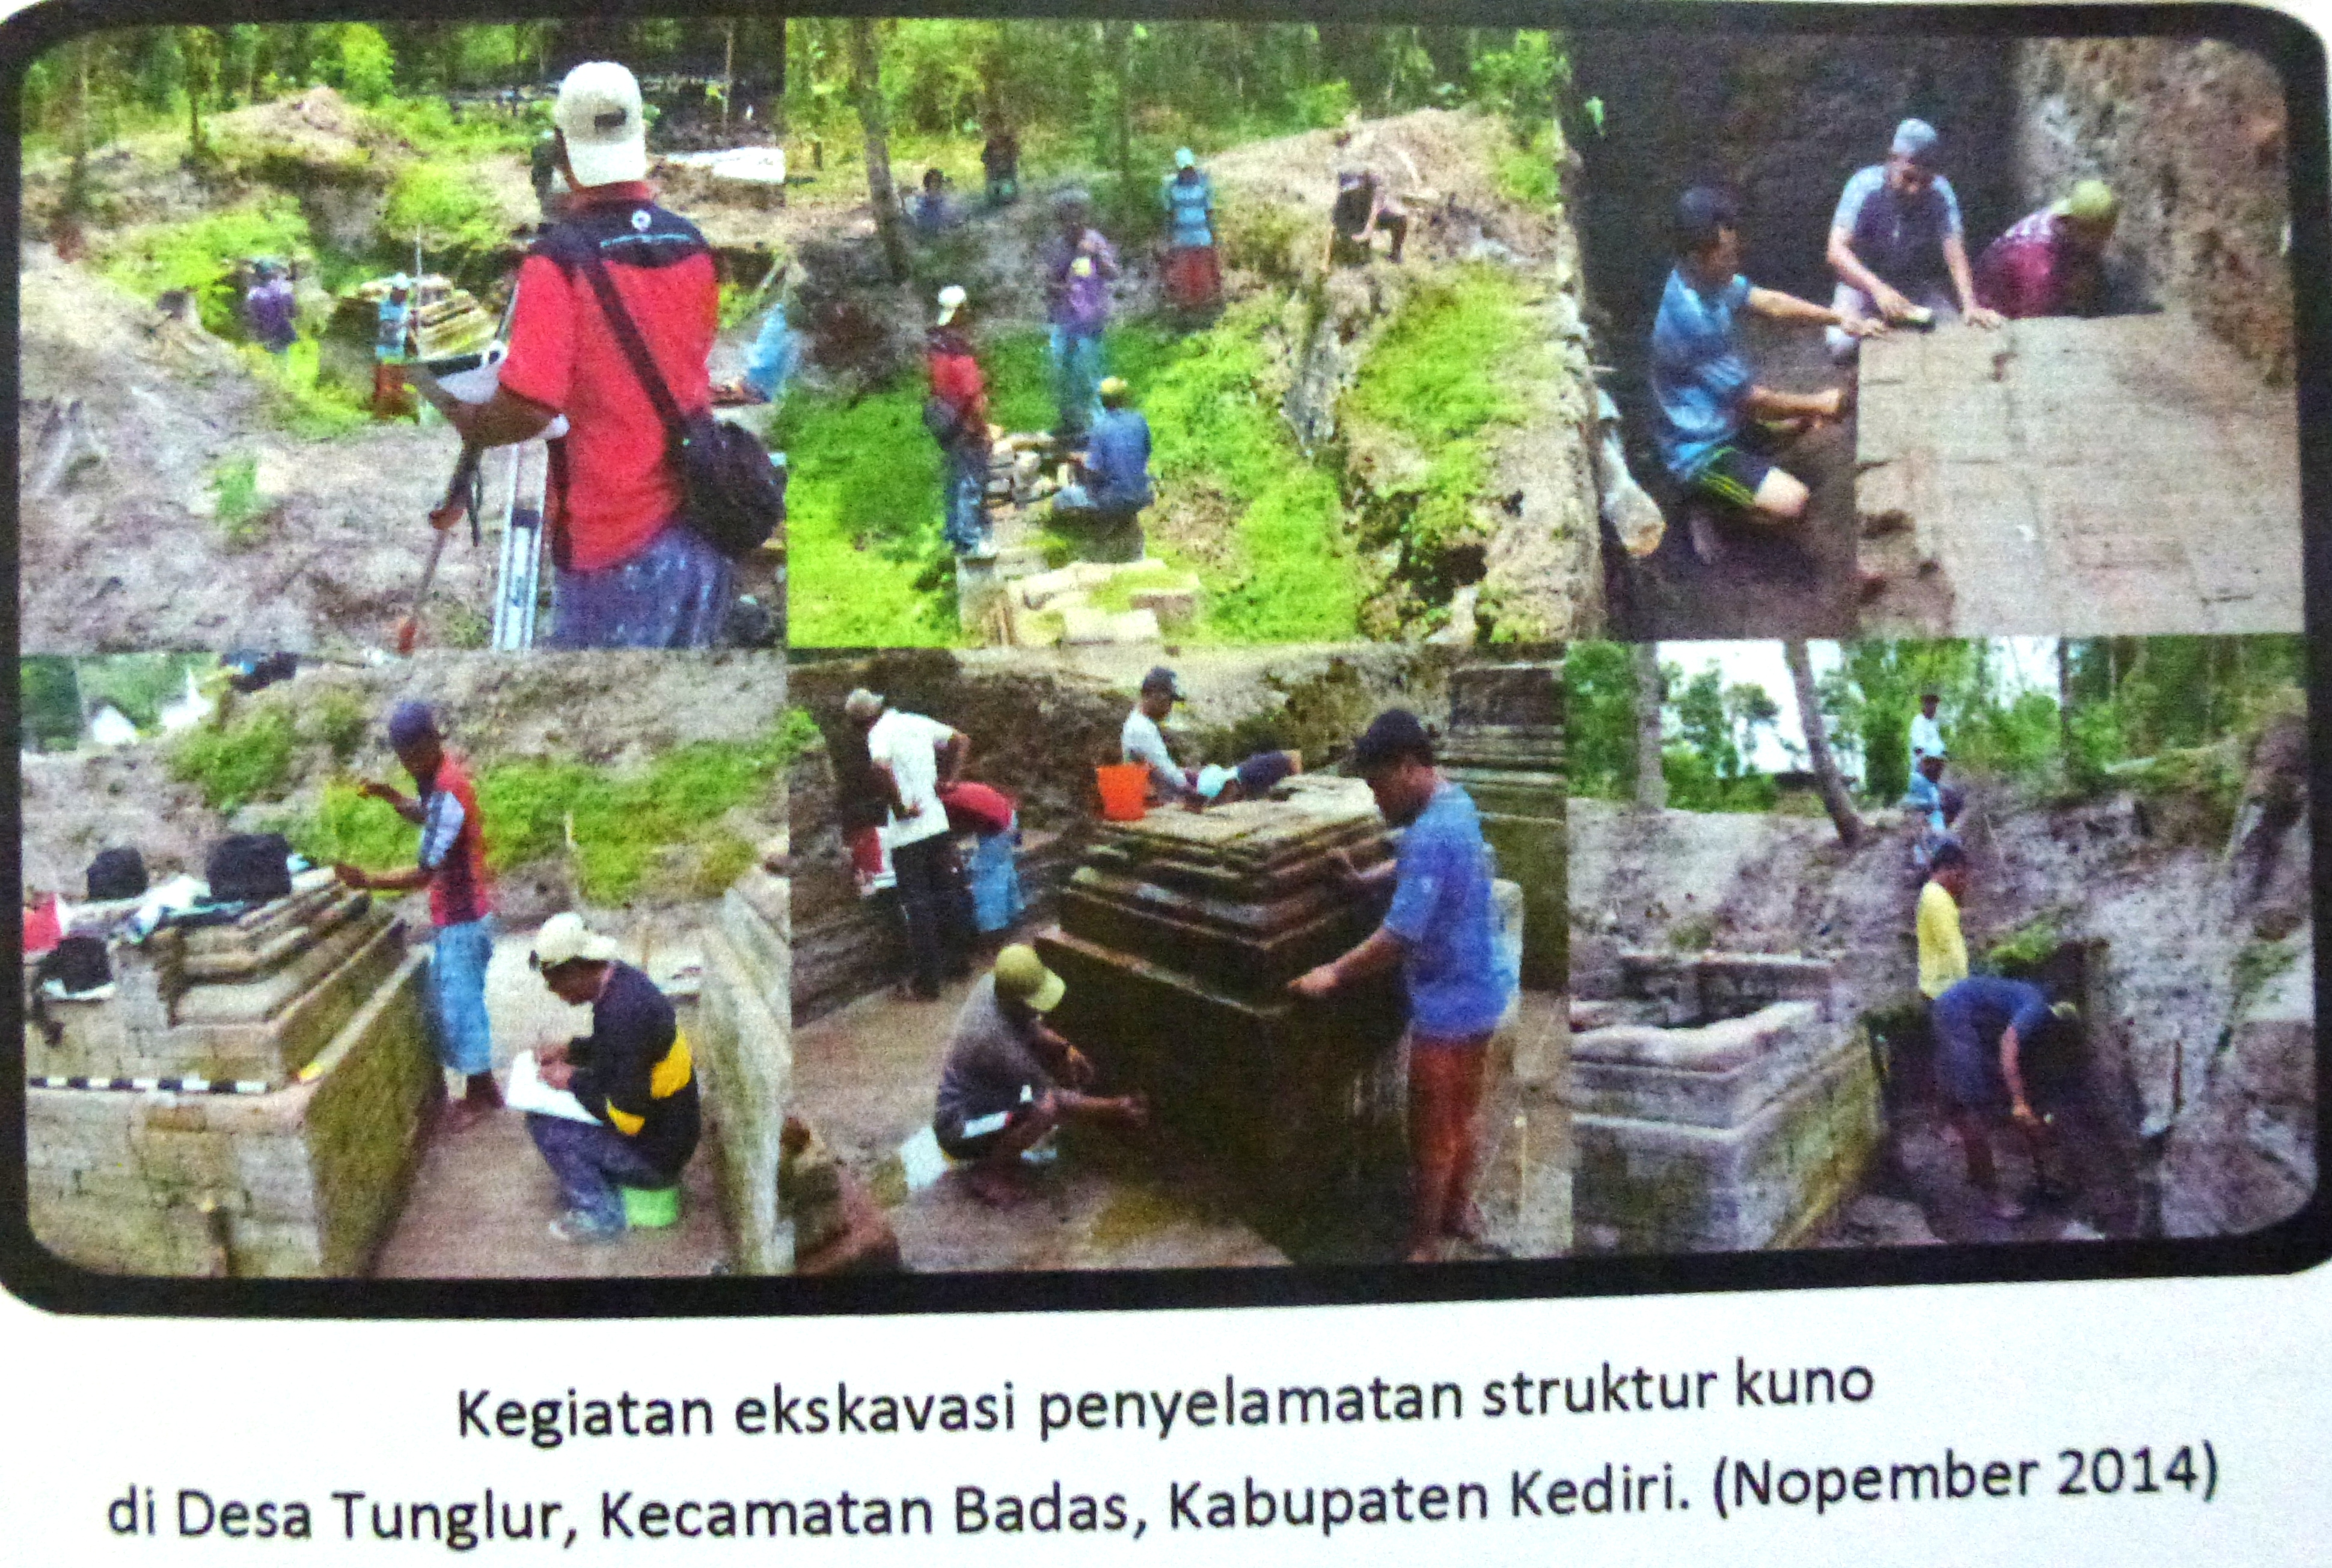 Kegiatan Bpcb Mojokerto Bulan November 2014 Balai Pelestarian Cagar Budaya